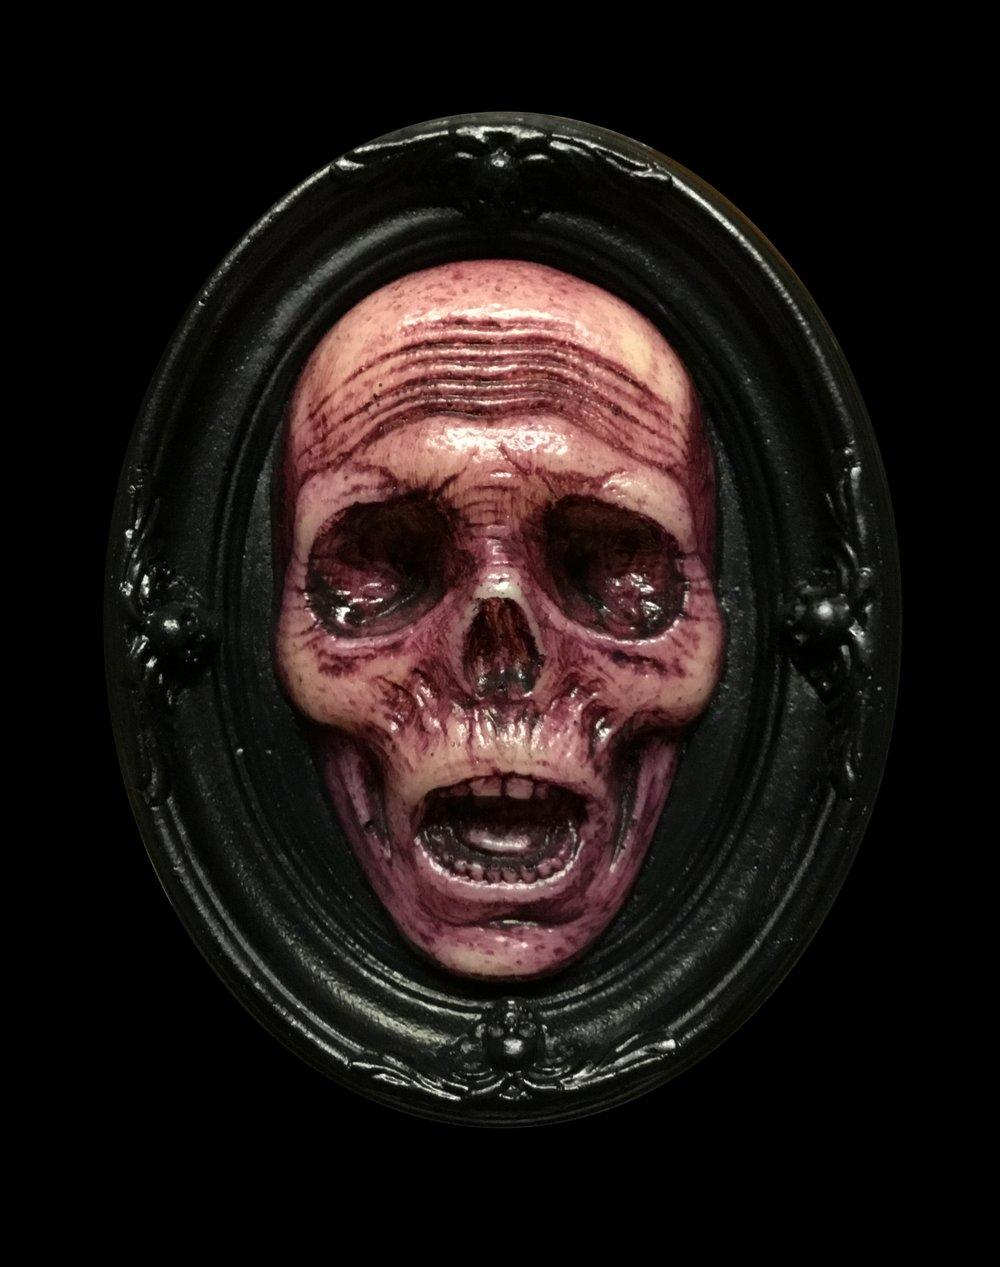 Glow in the Dark Death's Head Mini Plaque- Limited Edition- Magenta Edition